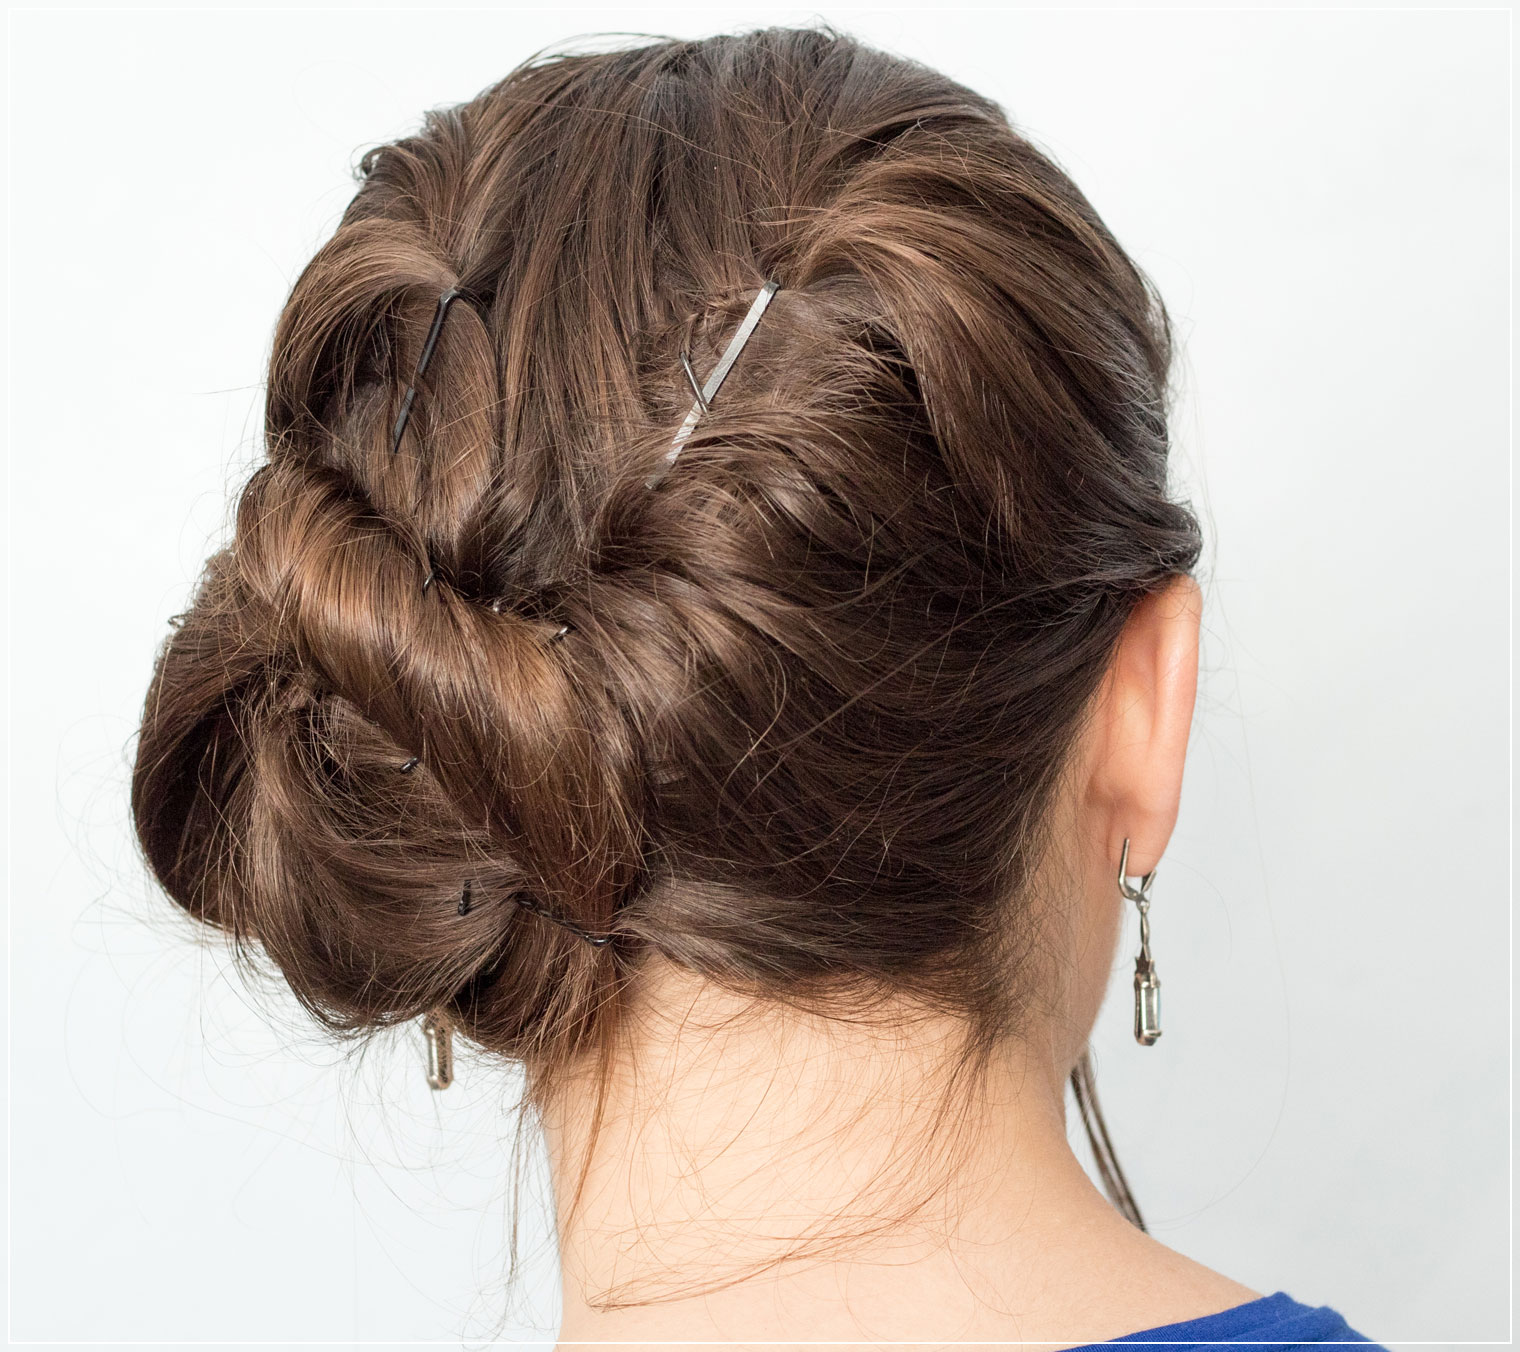 Rosetöne, Makeup Inspiration, Twisted Hairstyle, Hairtutorial, Make-Up Tutorial